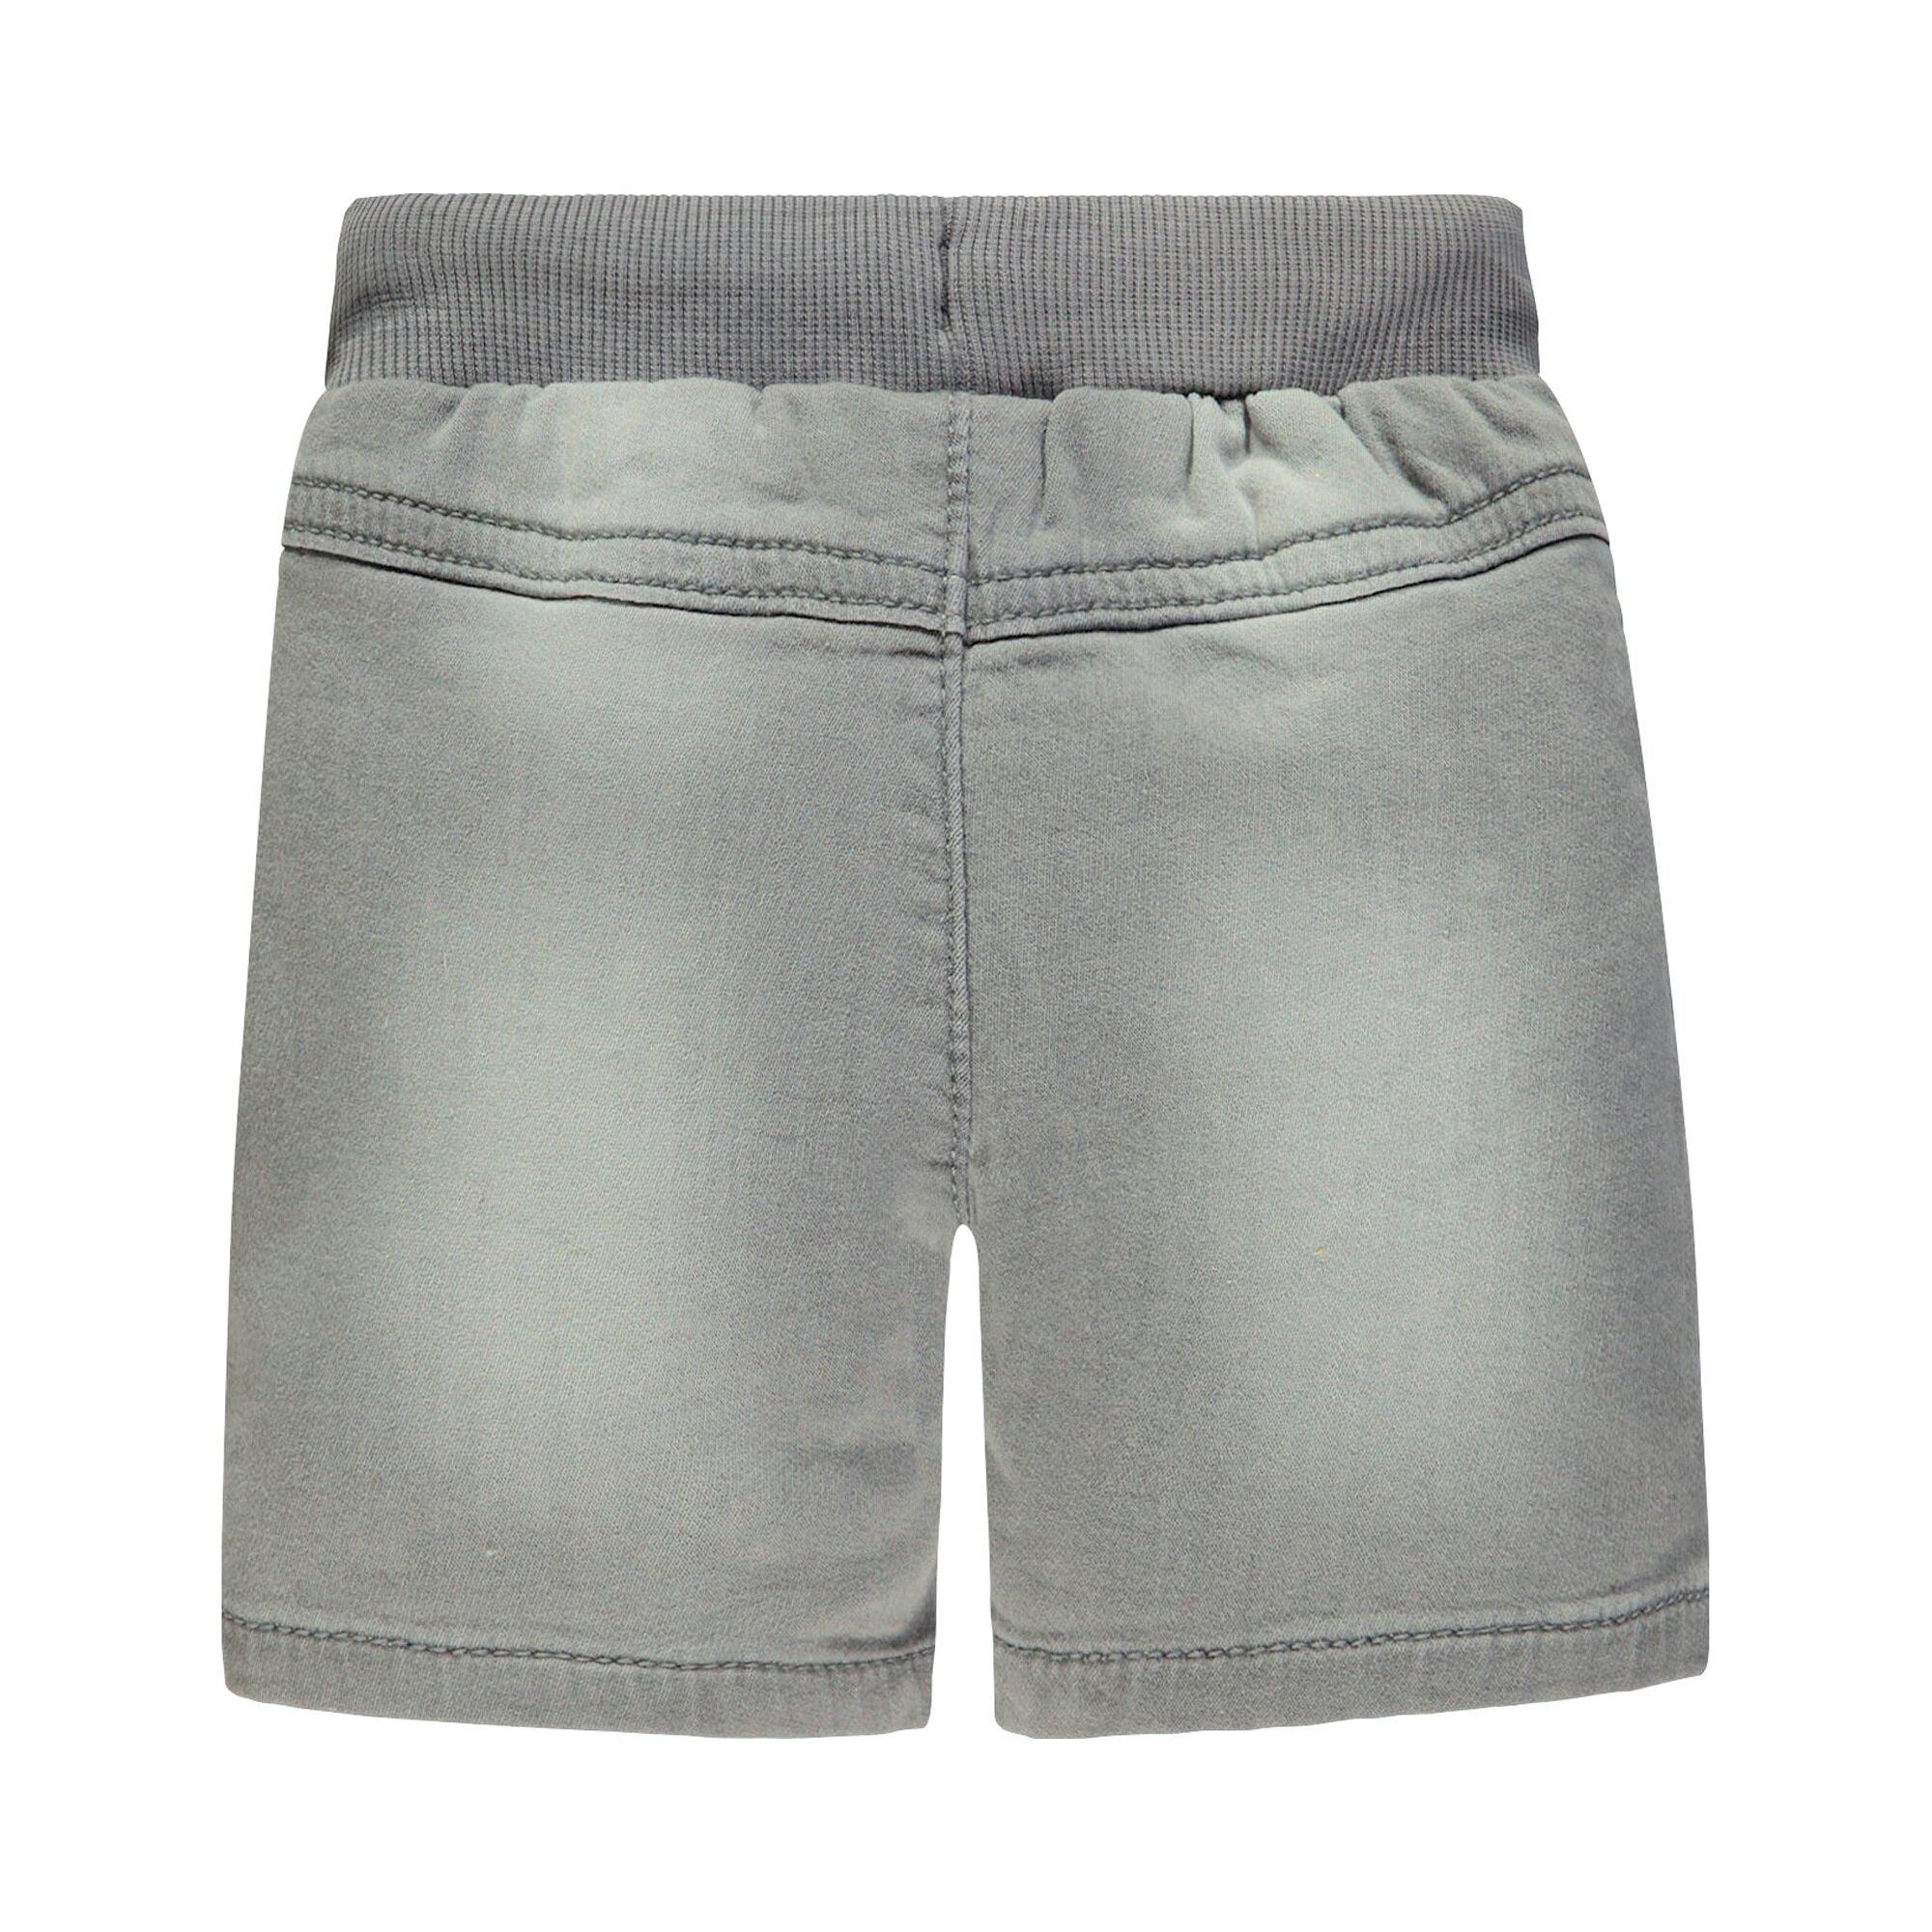 kanz-jeans-shorts